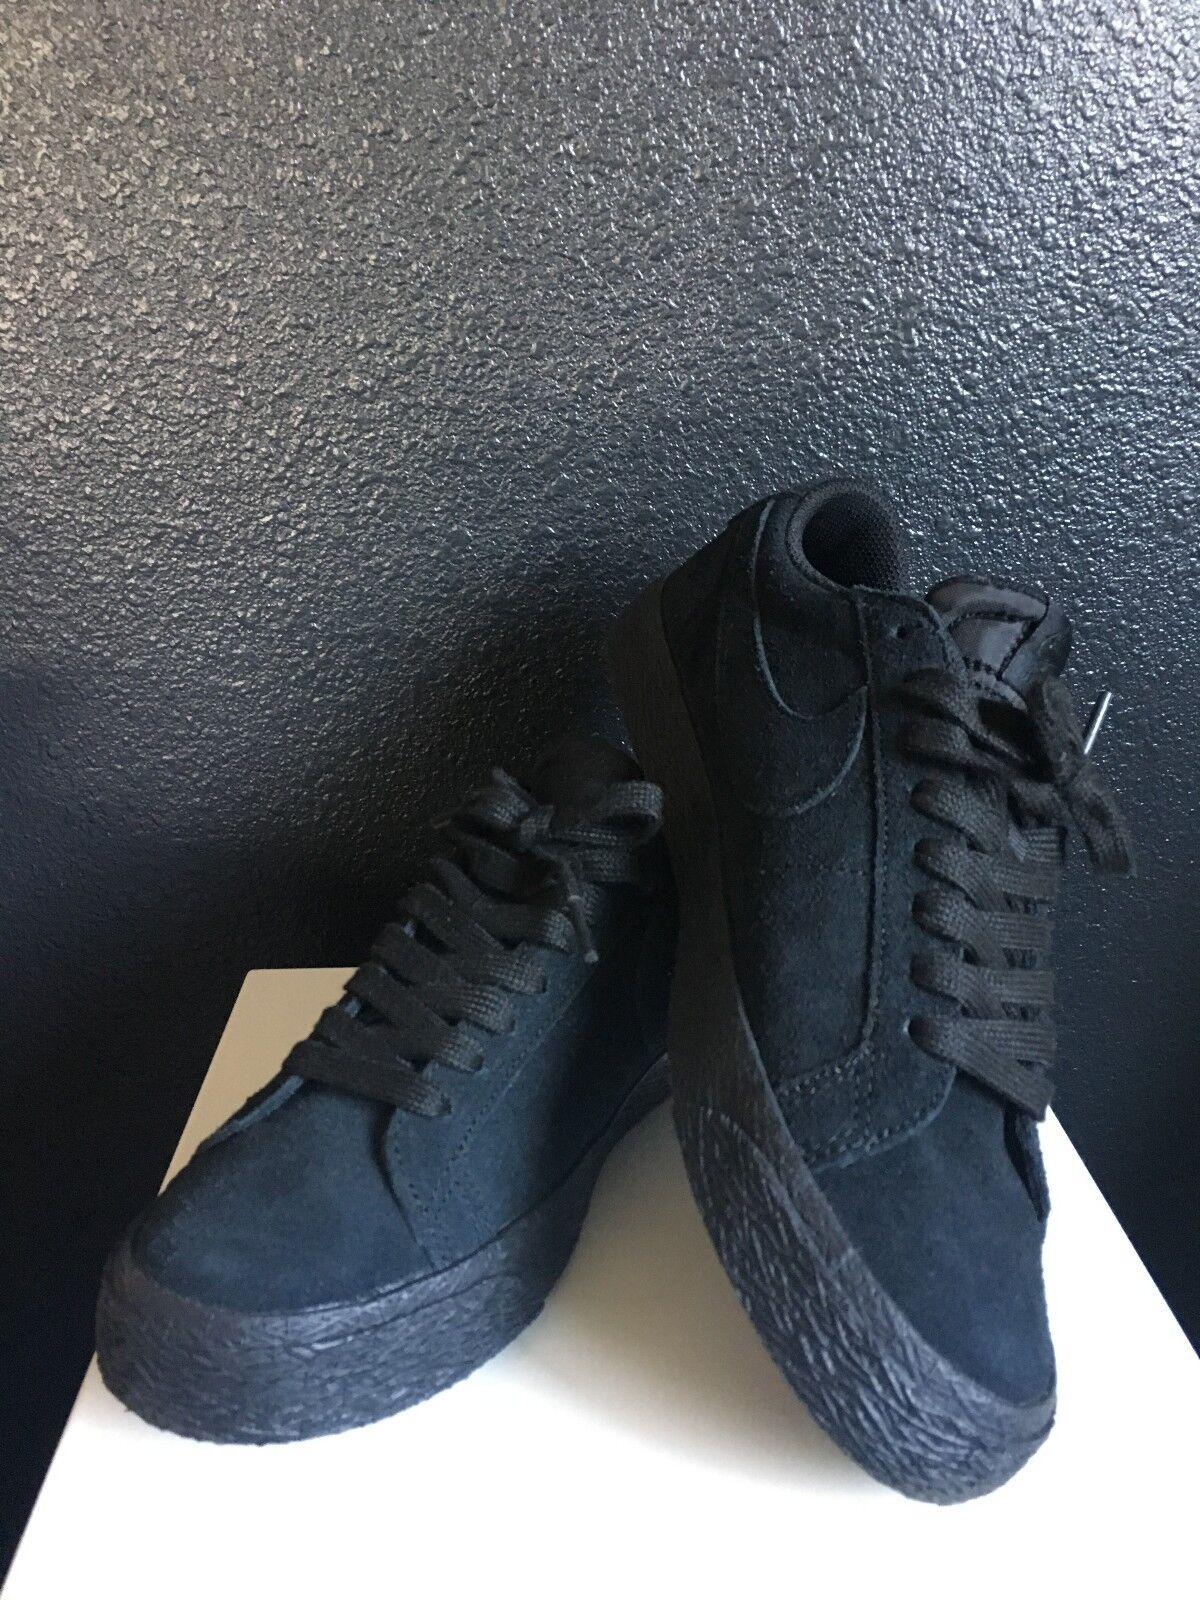 Nike SB Zoom Air Blazer Low Men's 6 All Black